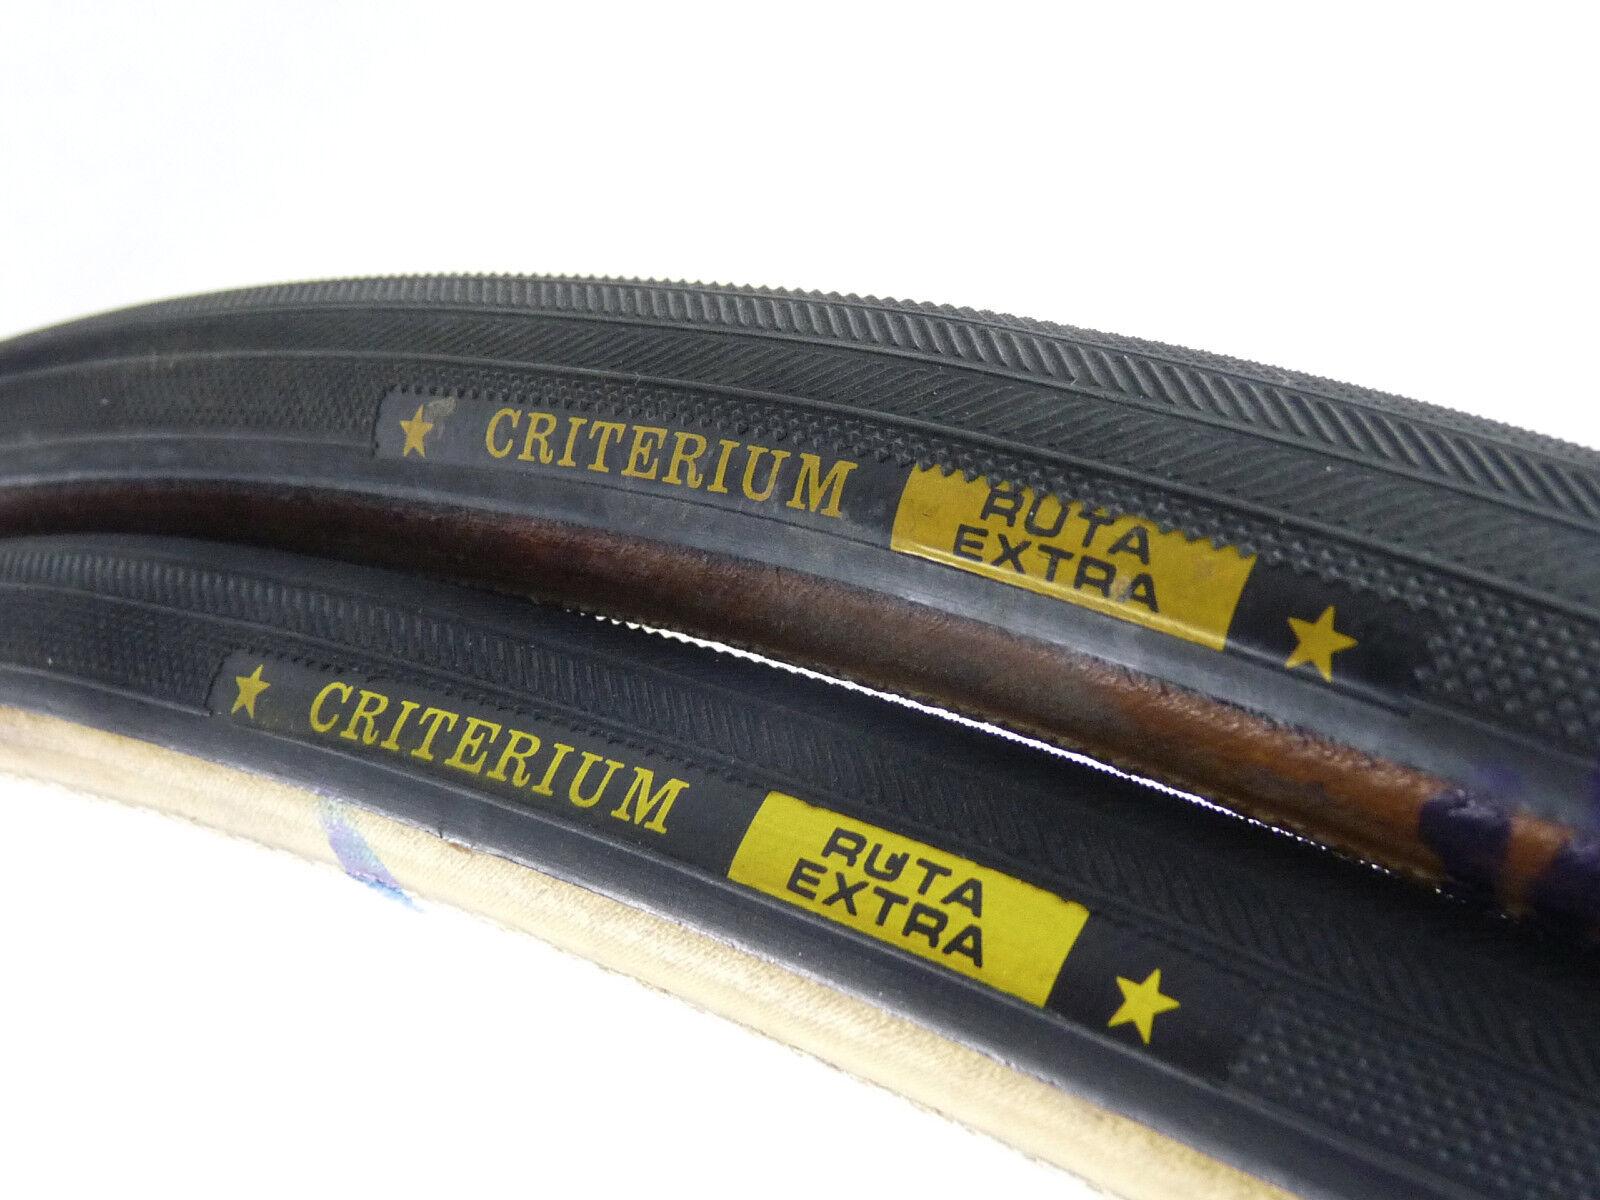 Juego de neumáticos Criterium Ruta extra Tubular Vintage Bicicleta de carretera 700c 27  plataina Nuevo Viejo Stock